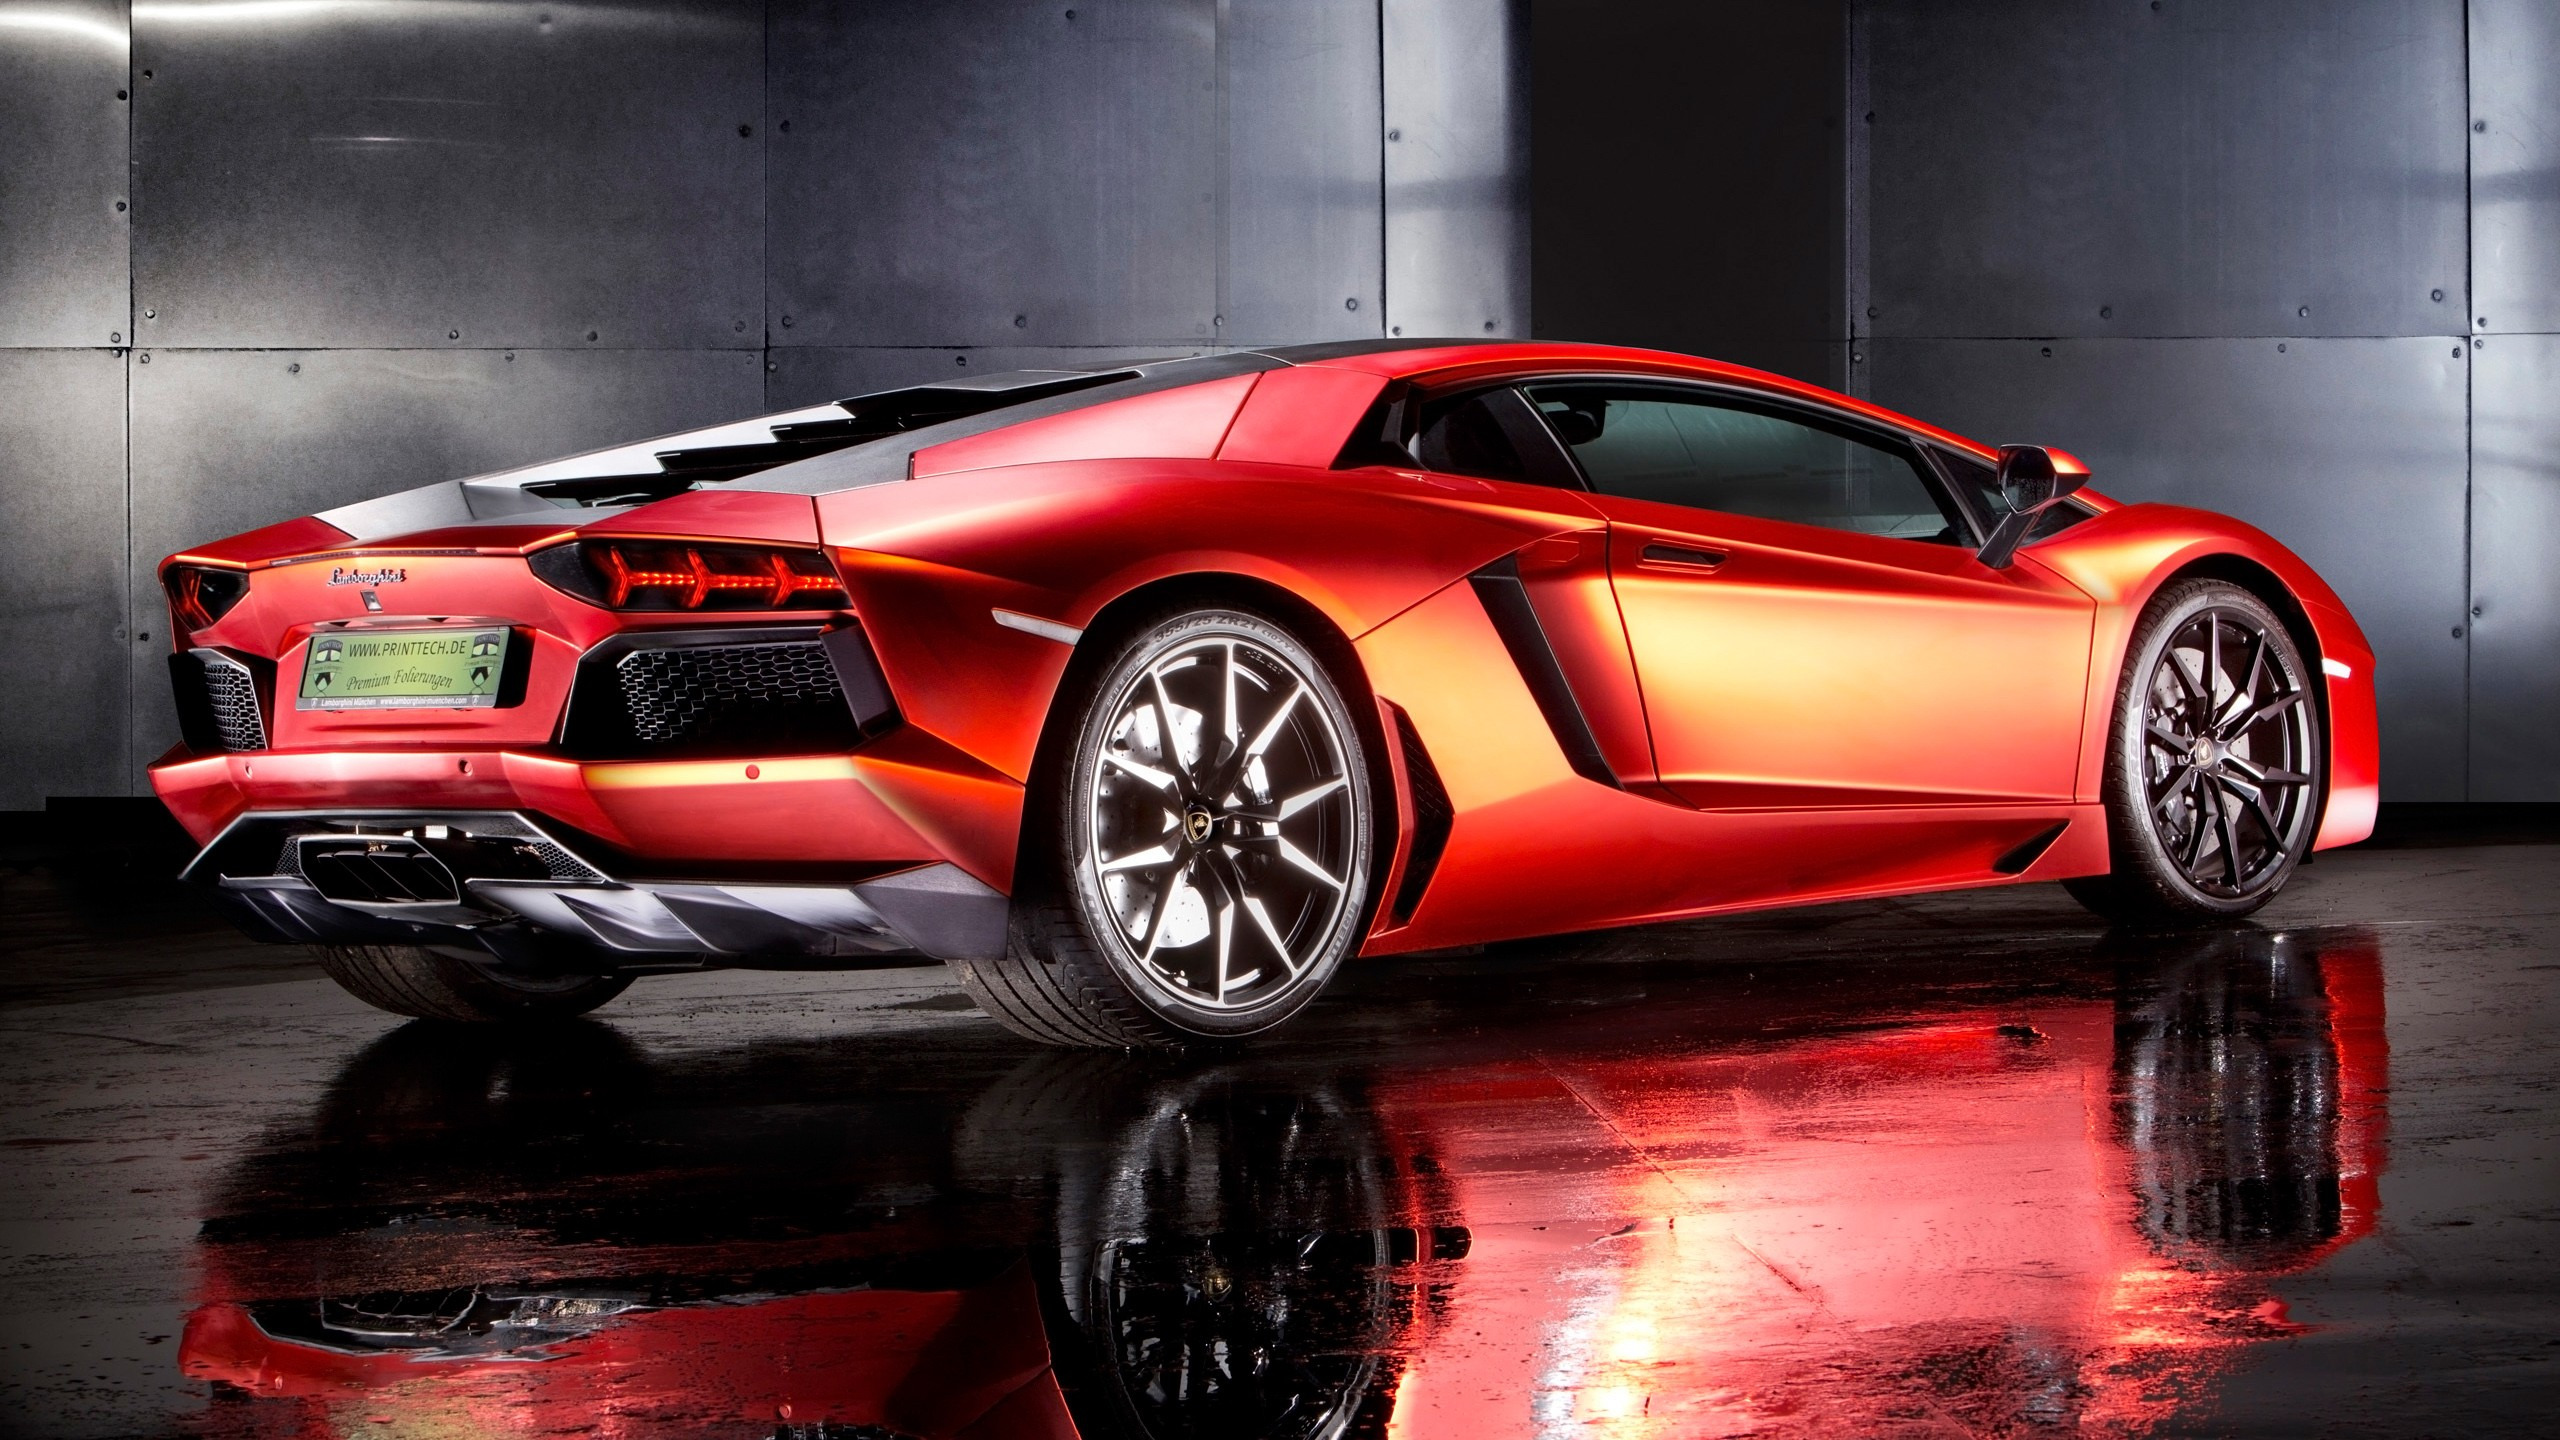 Lamborghini Aventador Hd Wallpapers 1080p 2013 Lamborghini Aventador By Print Tech 2 Wallpaper Hd